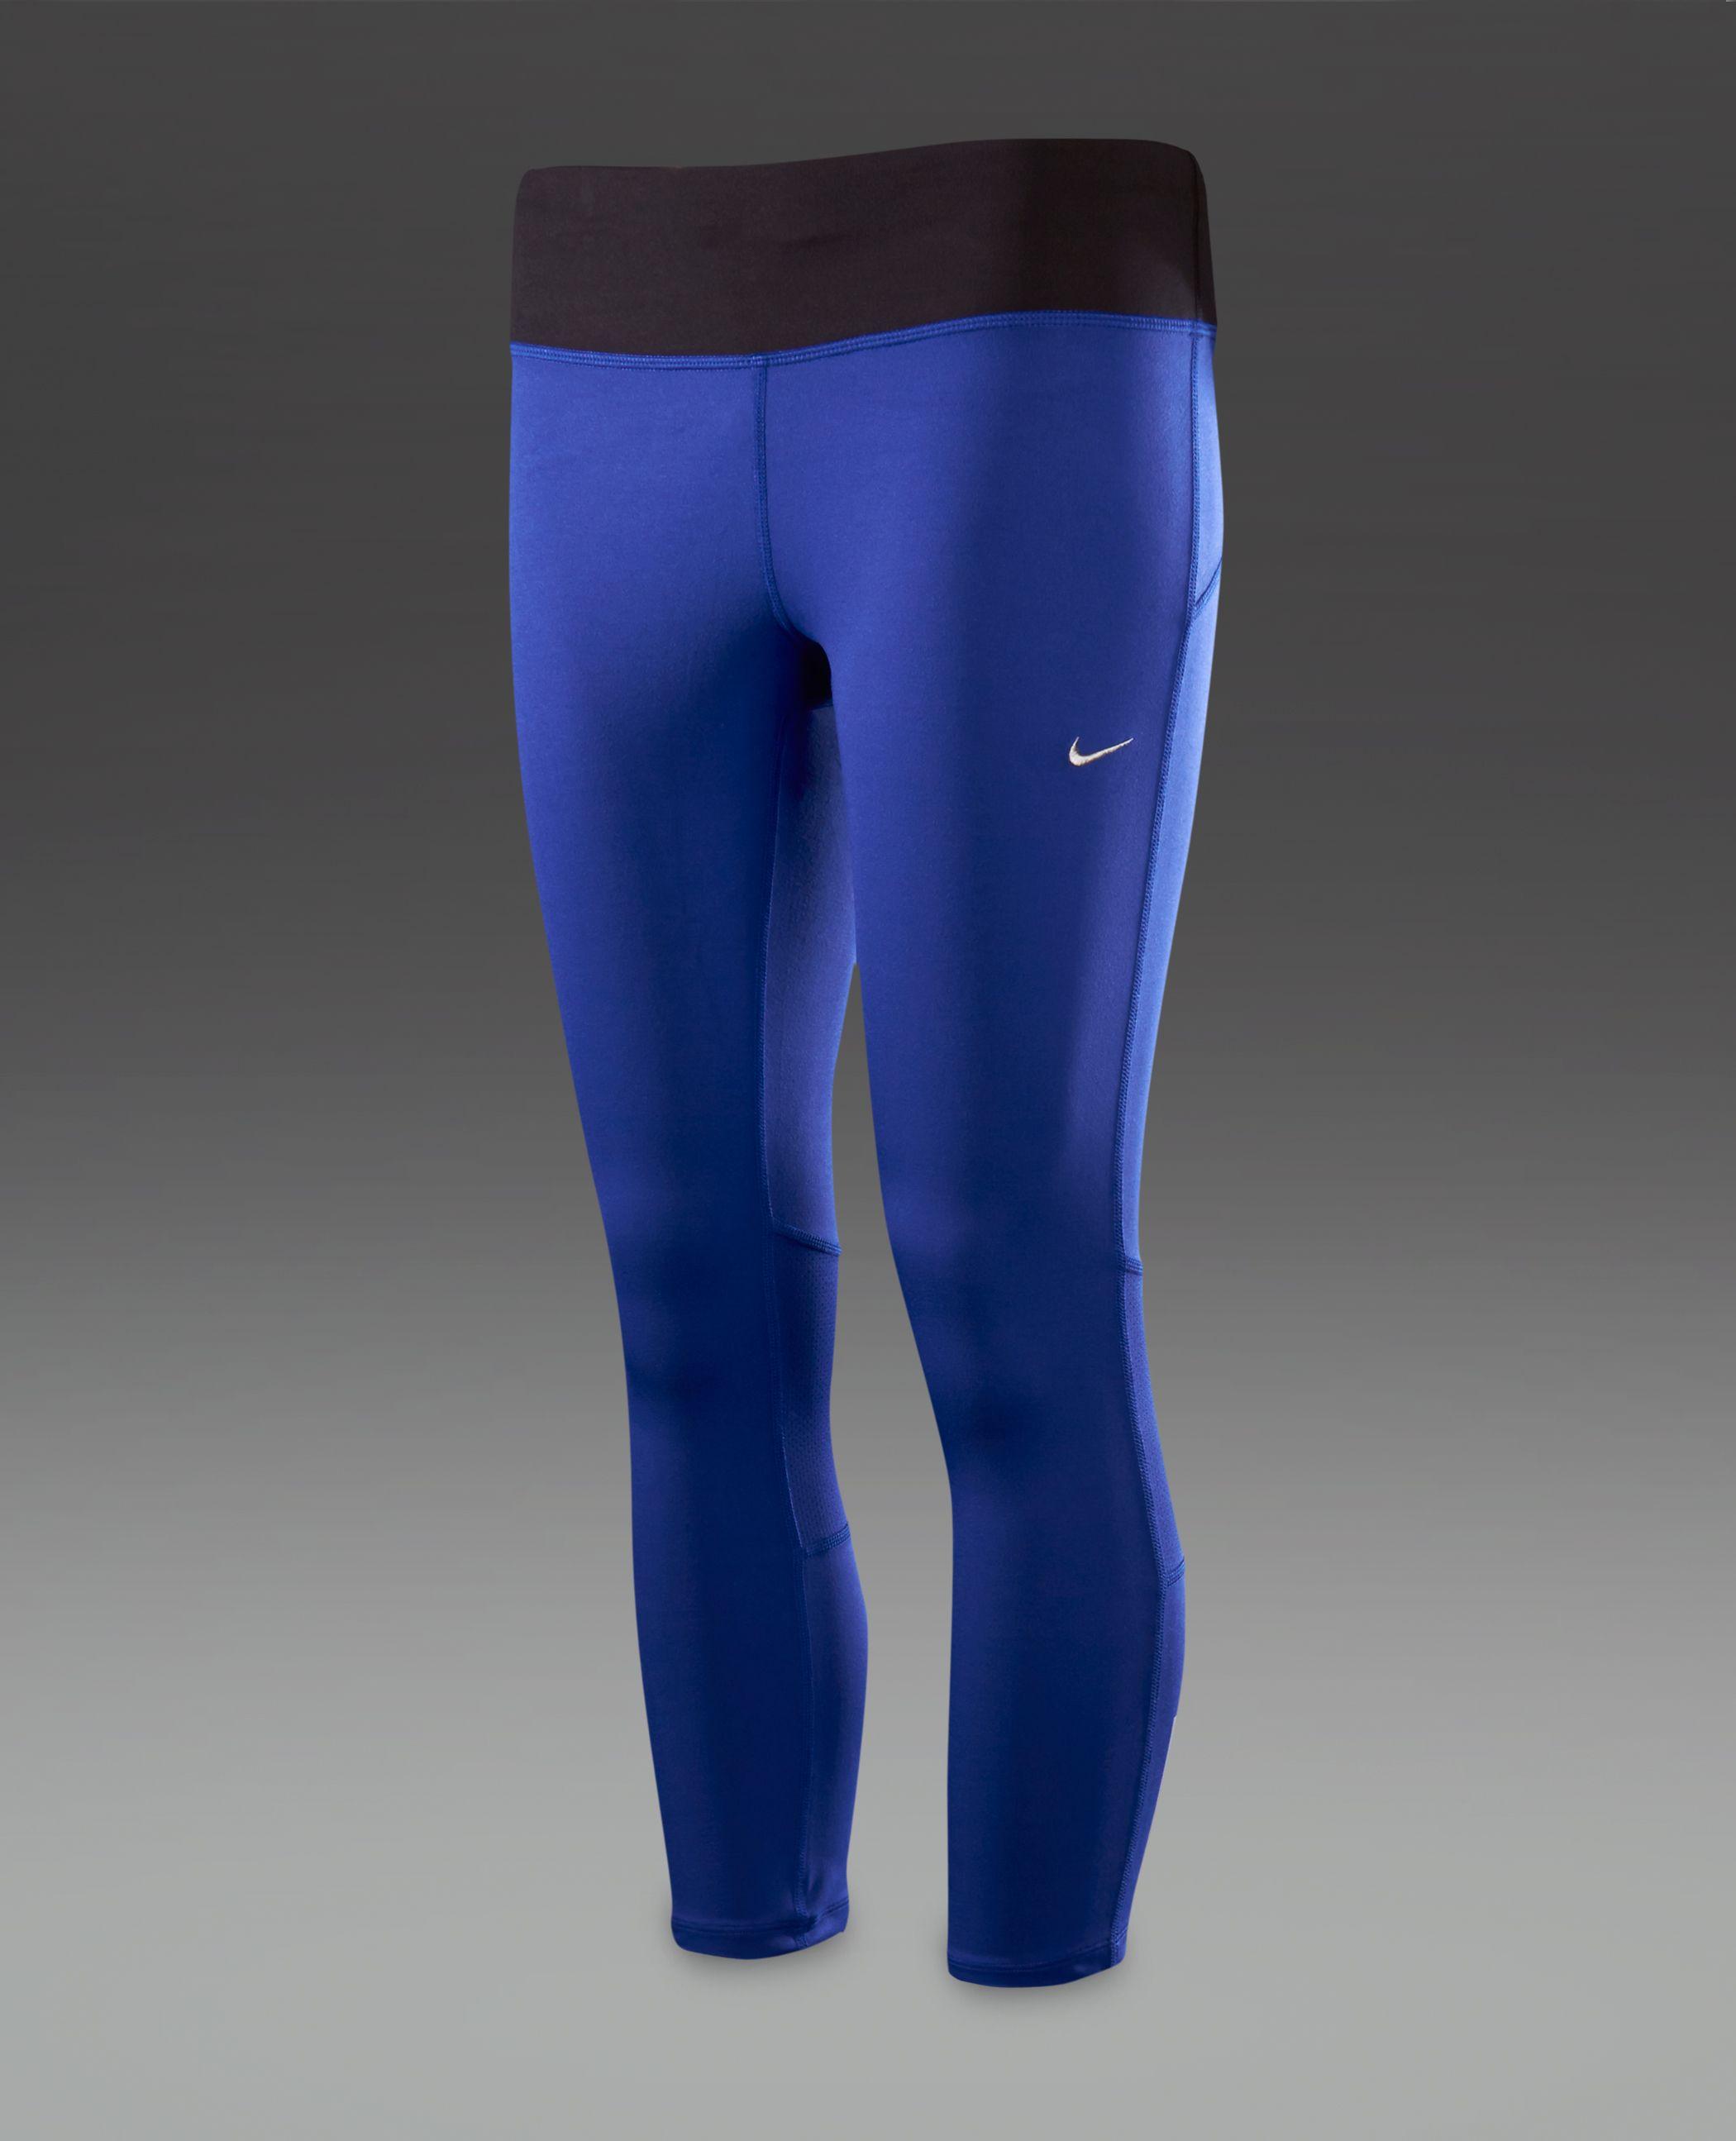 80e4d5ac62a81 Deep night/black/silver mid-rise Nike Epic Run cropped running tights.